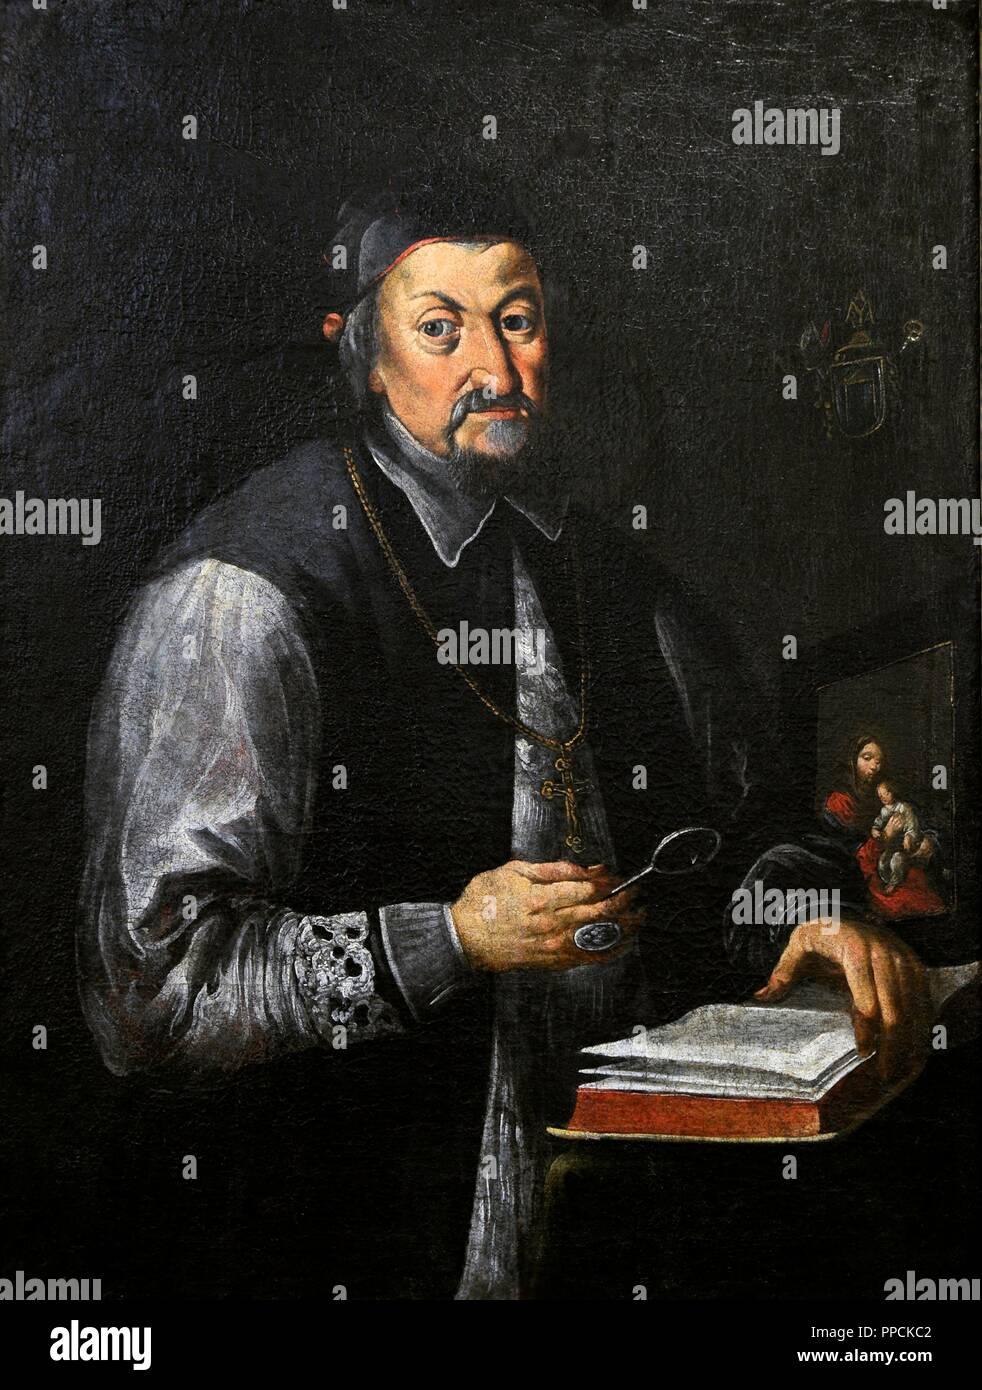 Portrait of Mikolaj Slupski (1616-1693). Bishop, the Suffragan of Byelorussia. By painter Johann Schretter (min. 1641-1685).Vilnius Picture Gallery. Lithuania. - Stock Image